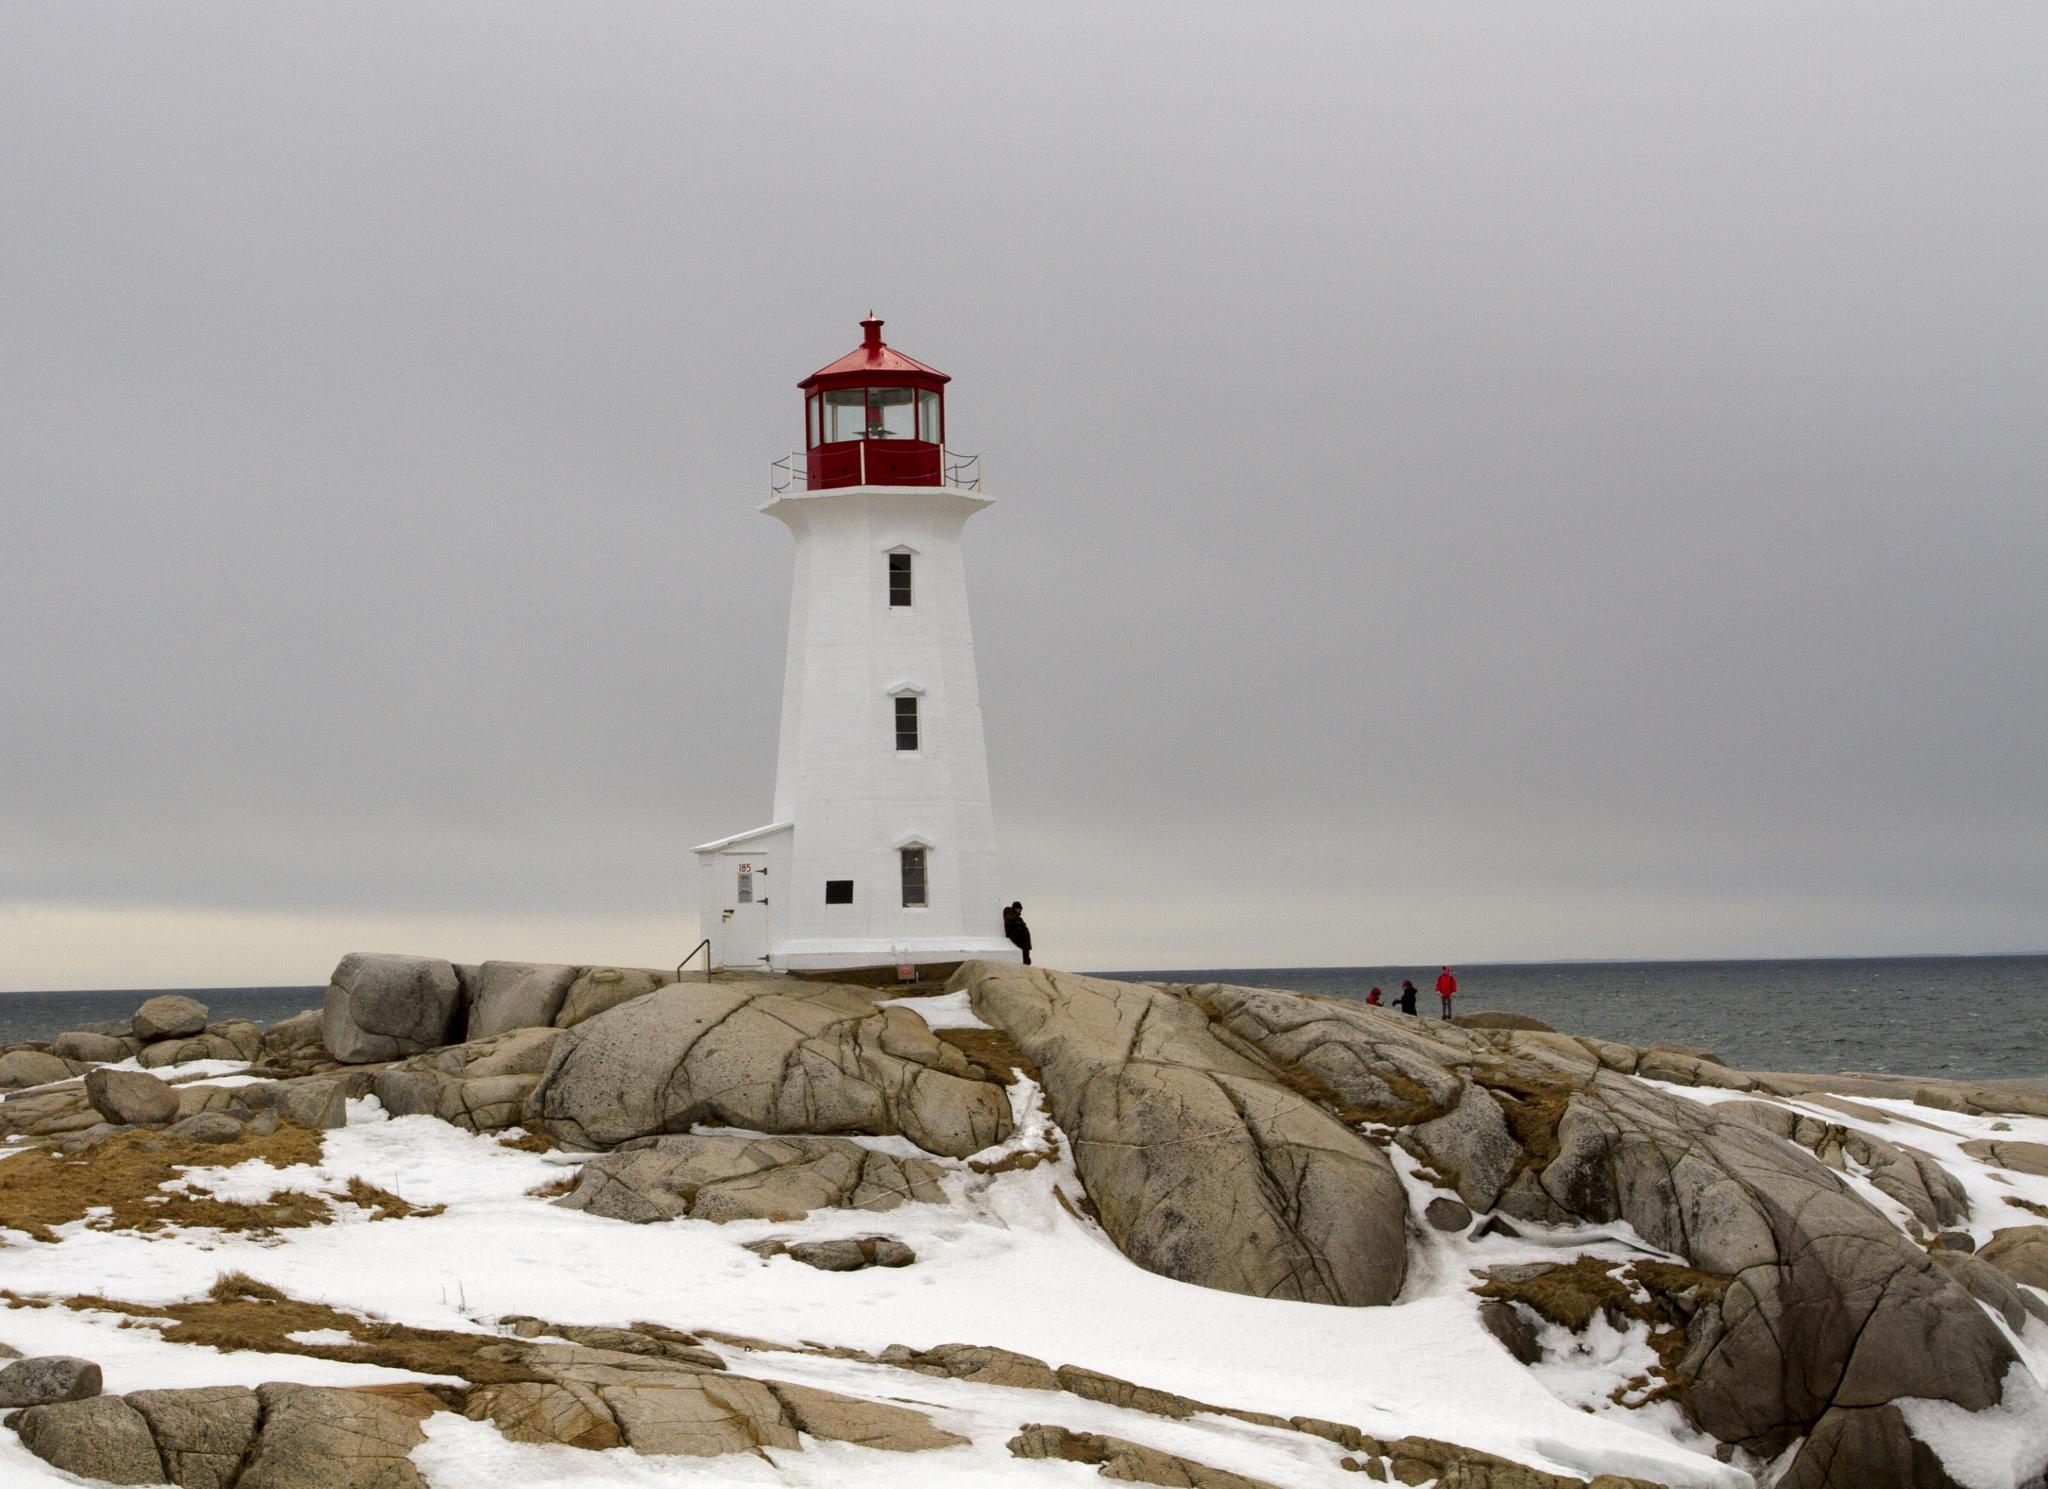 Peggys Cove Lighthouse by Joe Chrvala